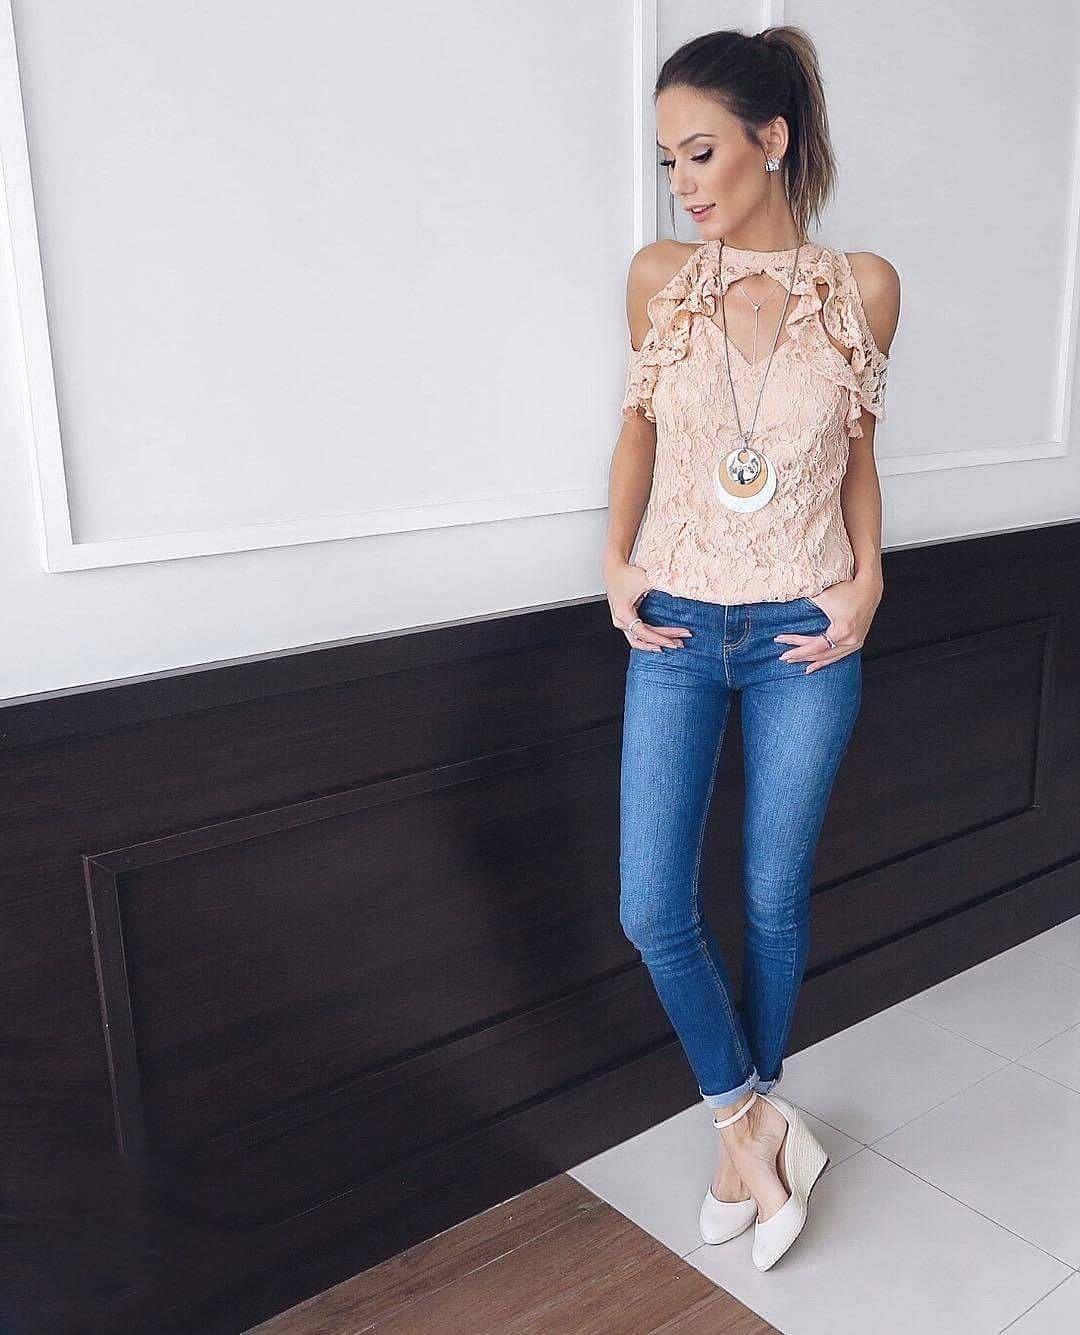 #renda #novidades 🙌🙌🙌  PEDIDOS:  (11) 968729942  🌹🌻🌸  #averarafashion  #store_dailyfashion  #boraarrasar   #moda #lookdodia #modafeminina #modaparameninas #modaparamulheres #fashionbloguer #fashionista #fashion #partydress #look